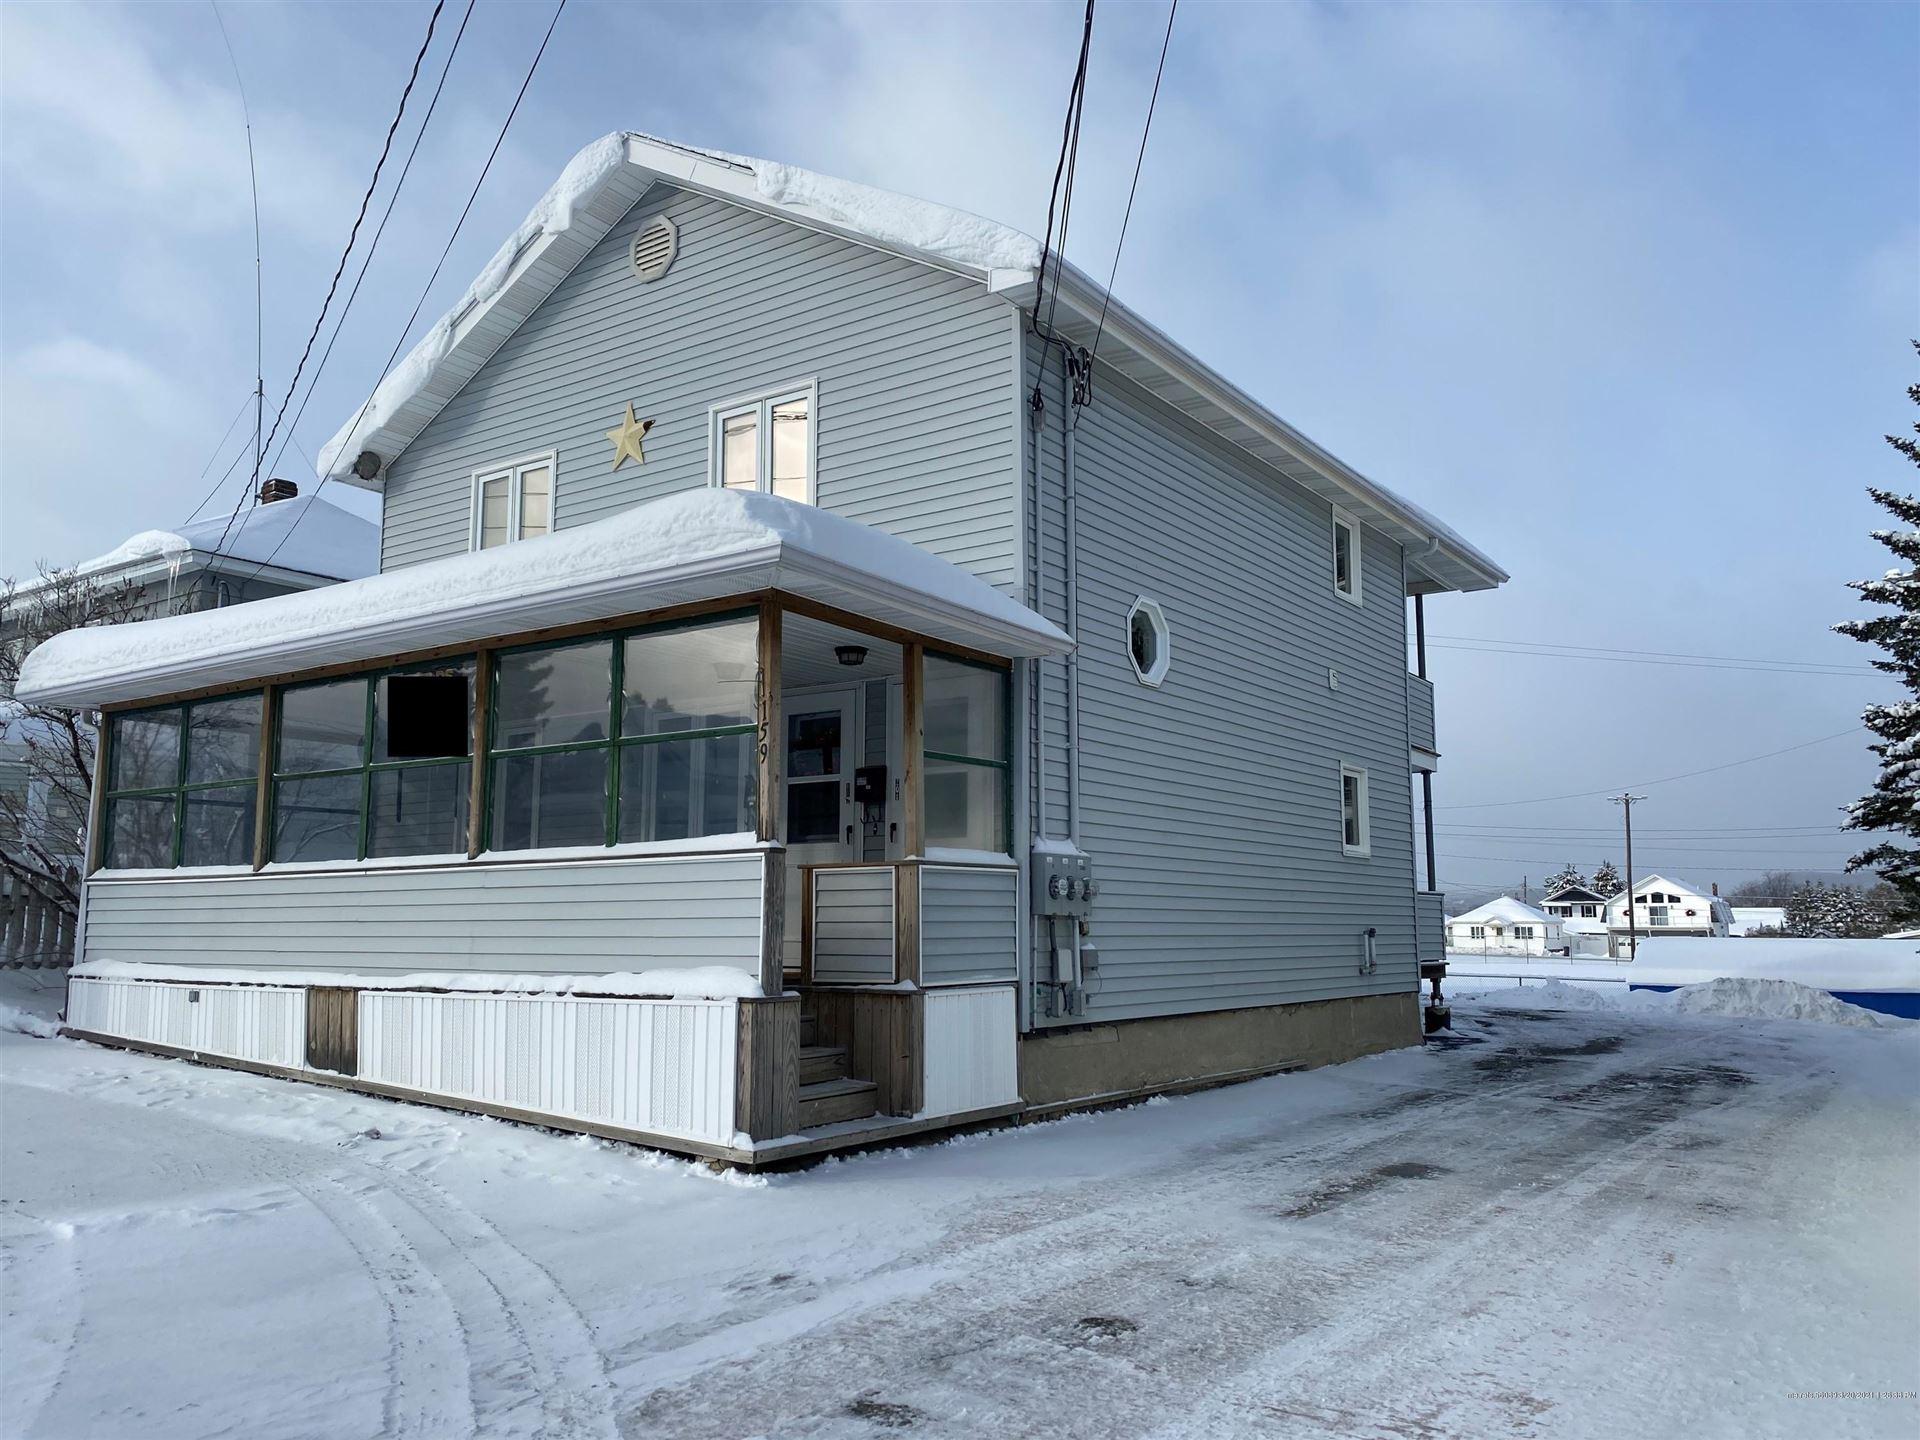 Photo of 159 Pleasant Avenue, Madawaska, ME 04756 (MLS # 1478244)